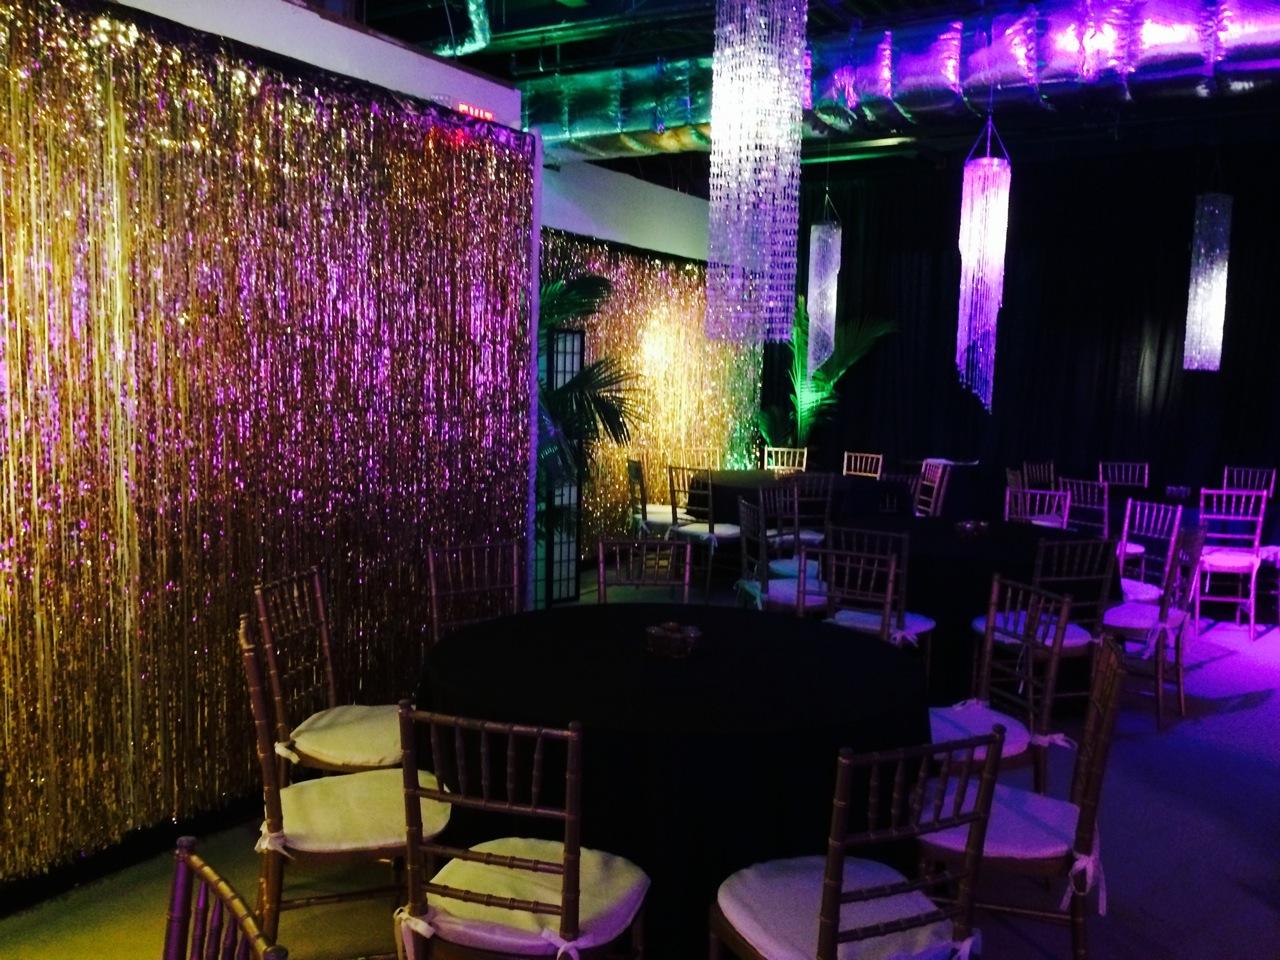 Great Gatsby Theme - Eggsotic Events NJ NYC Event Decor Design Lighting Room Transformation Art Deco Speakeasy The Great Gatsby Decorations and Lighting 6.jpg